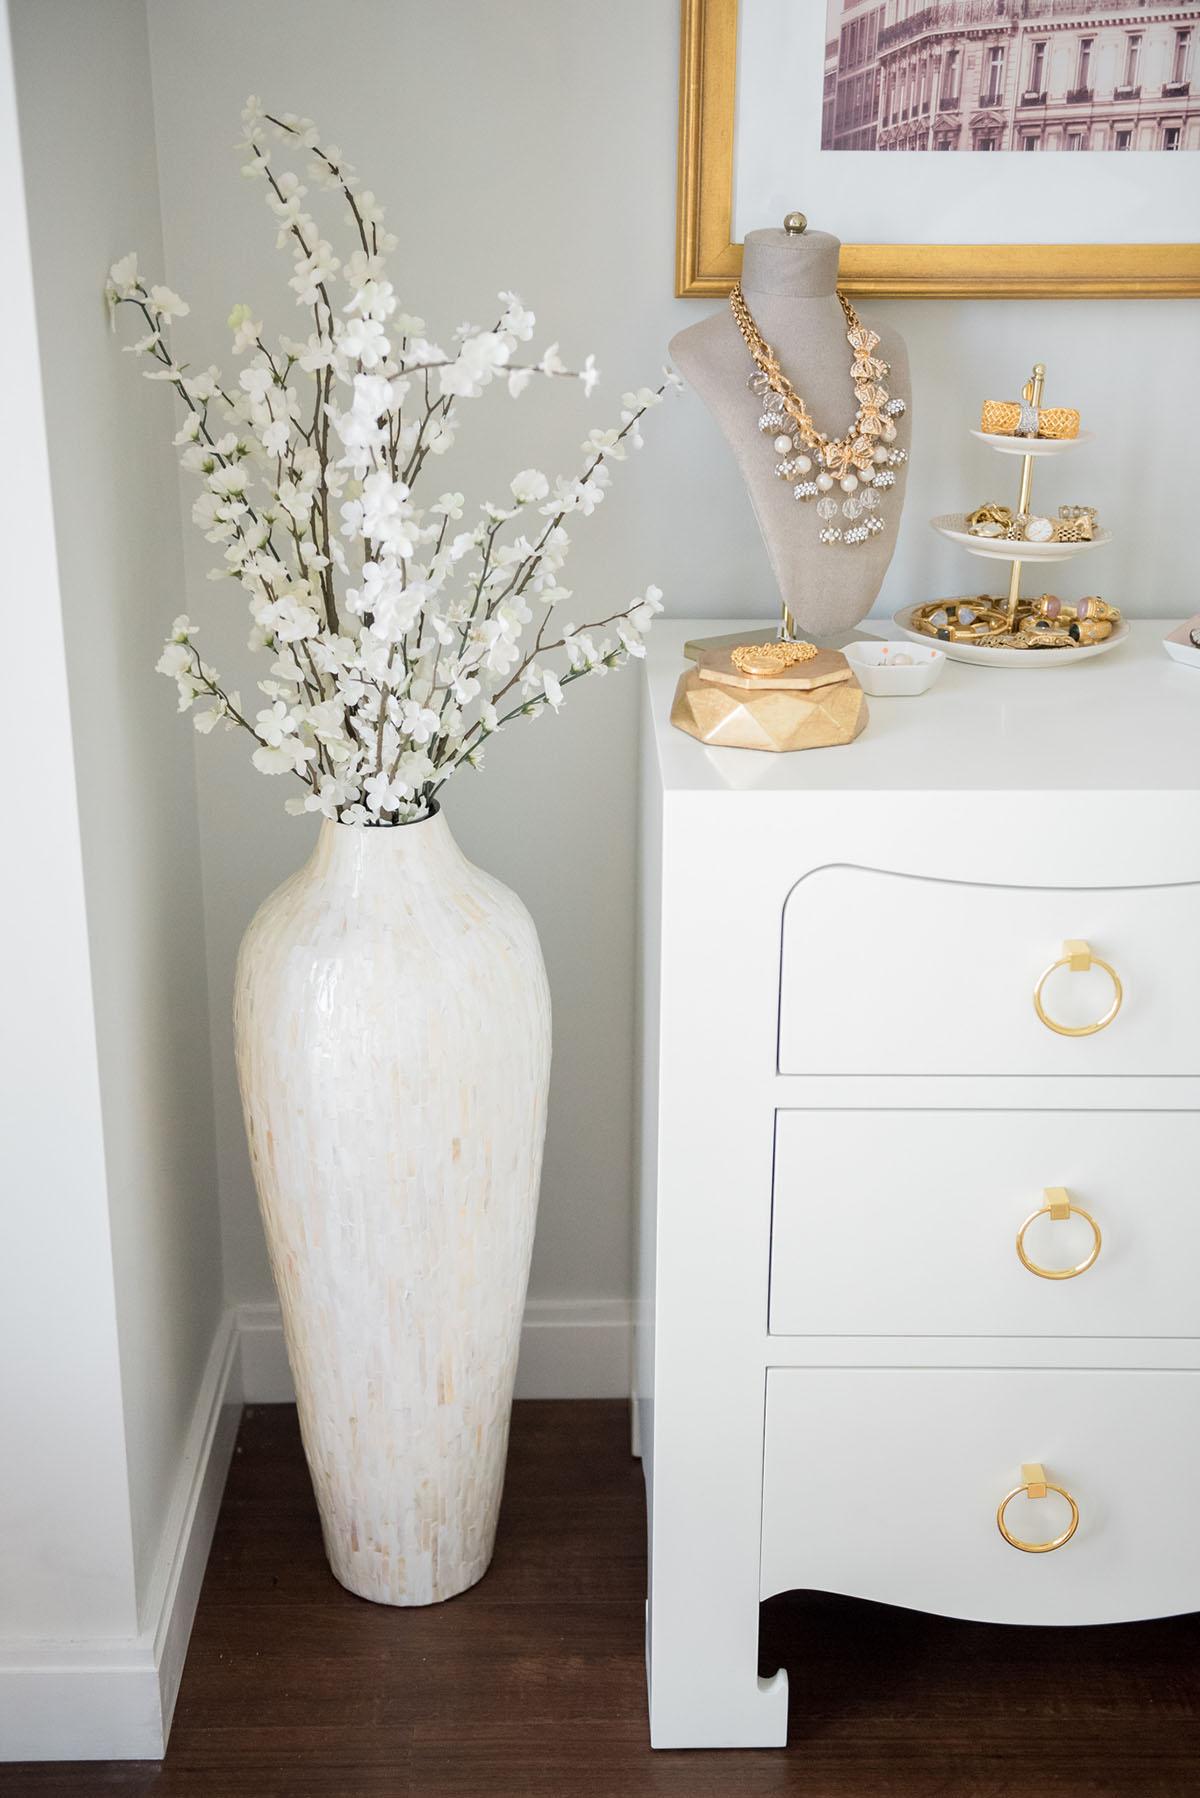 10 Ways to Fill Empty Corners With Floor Vases